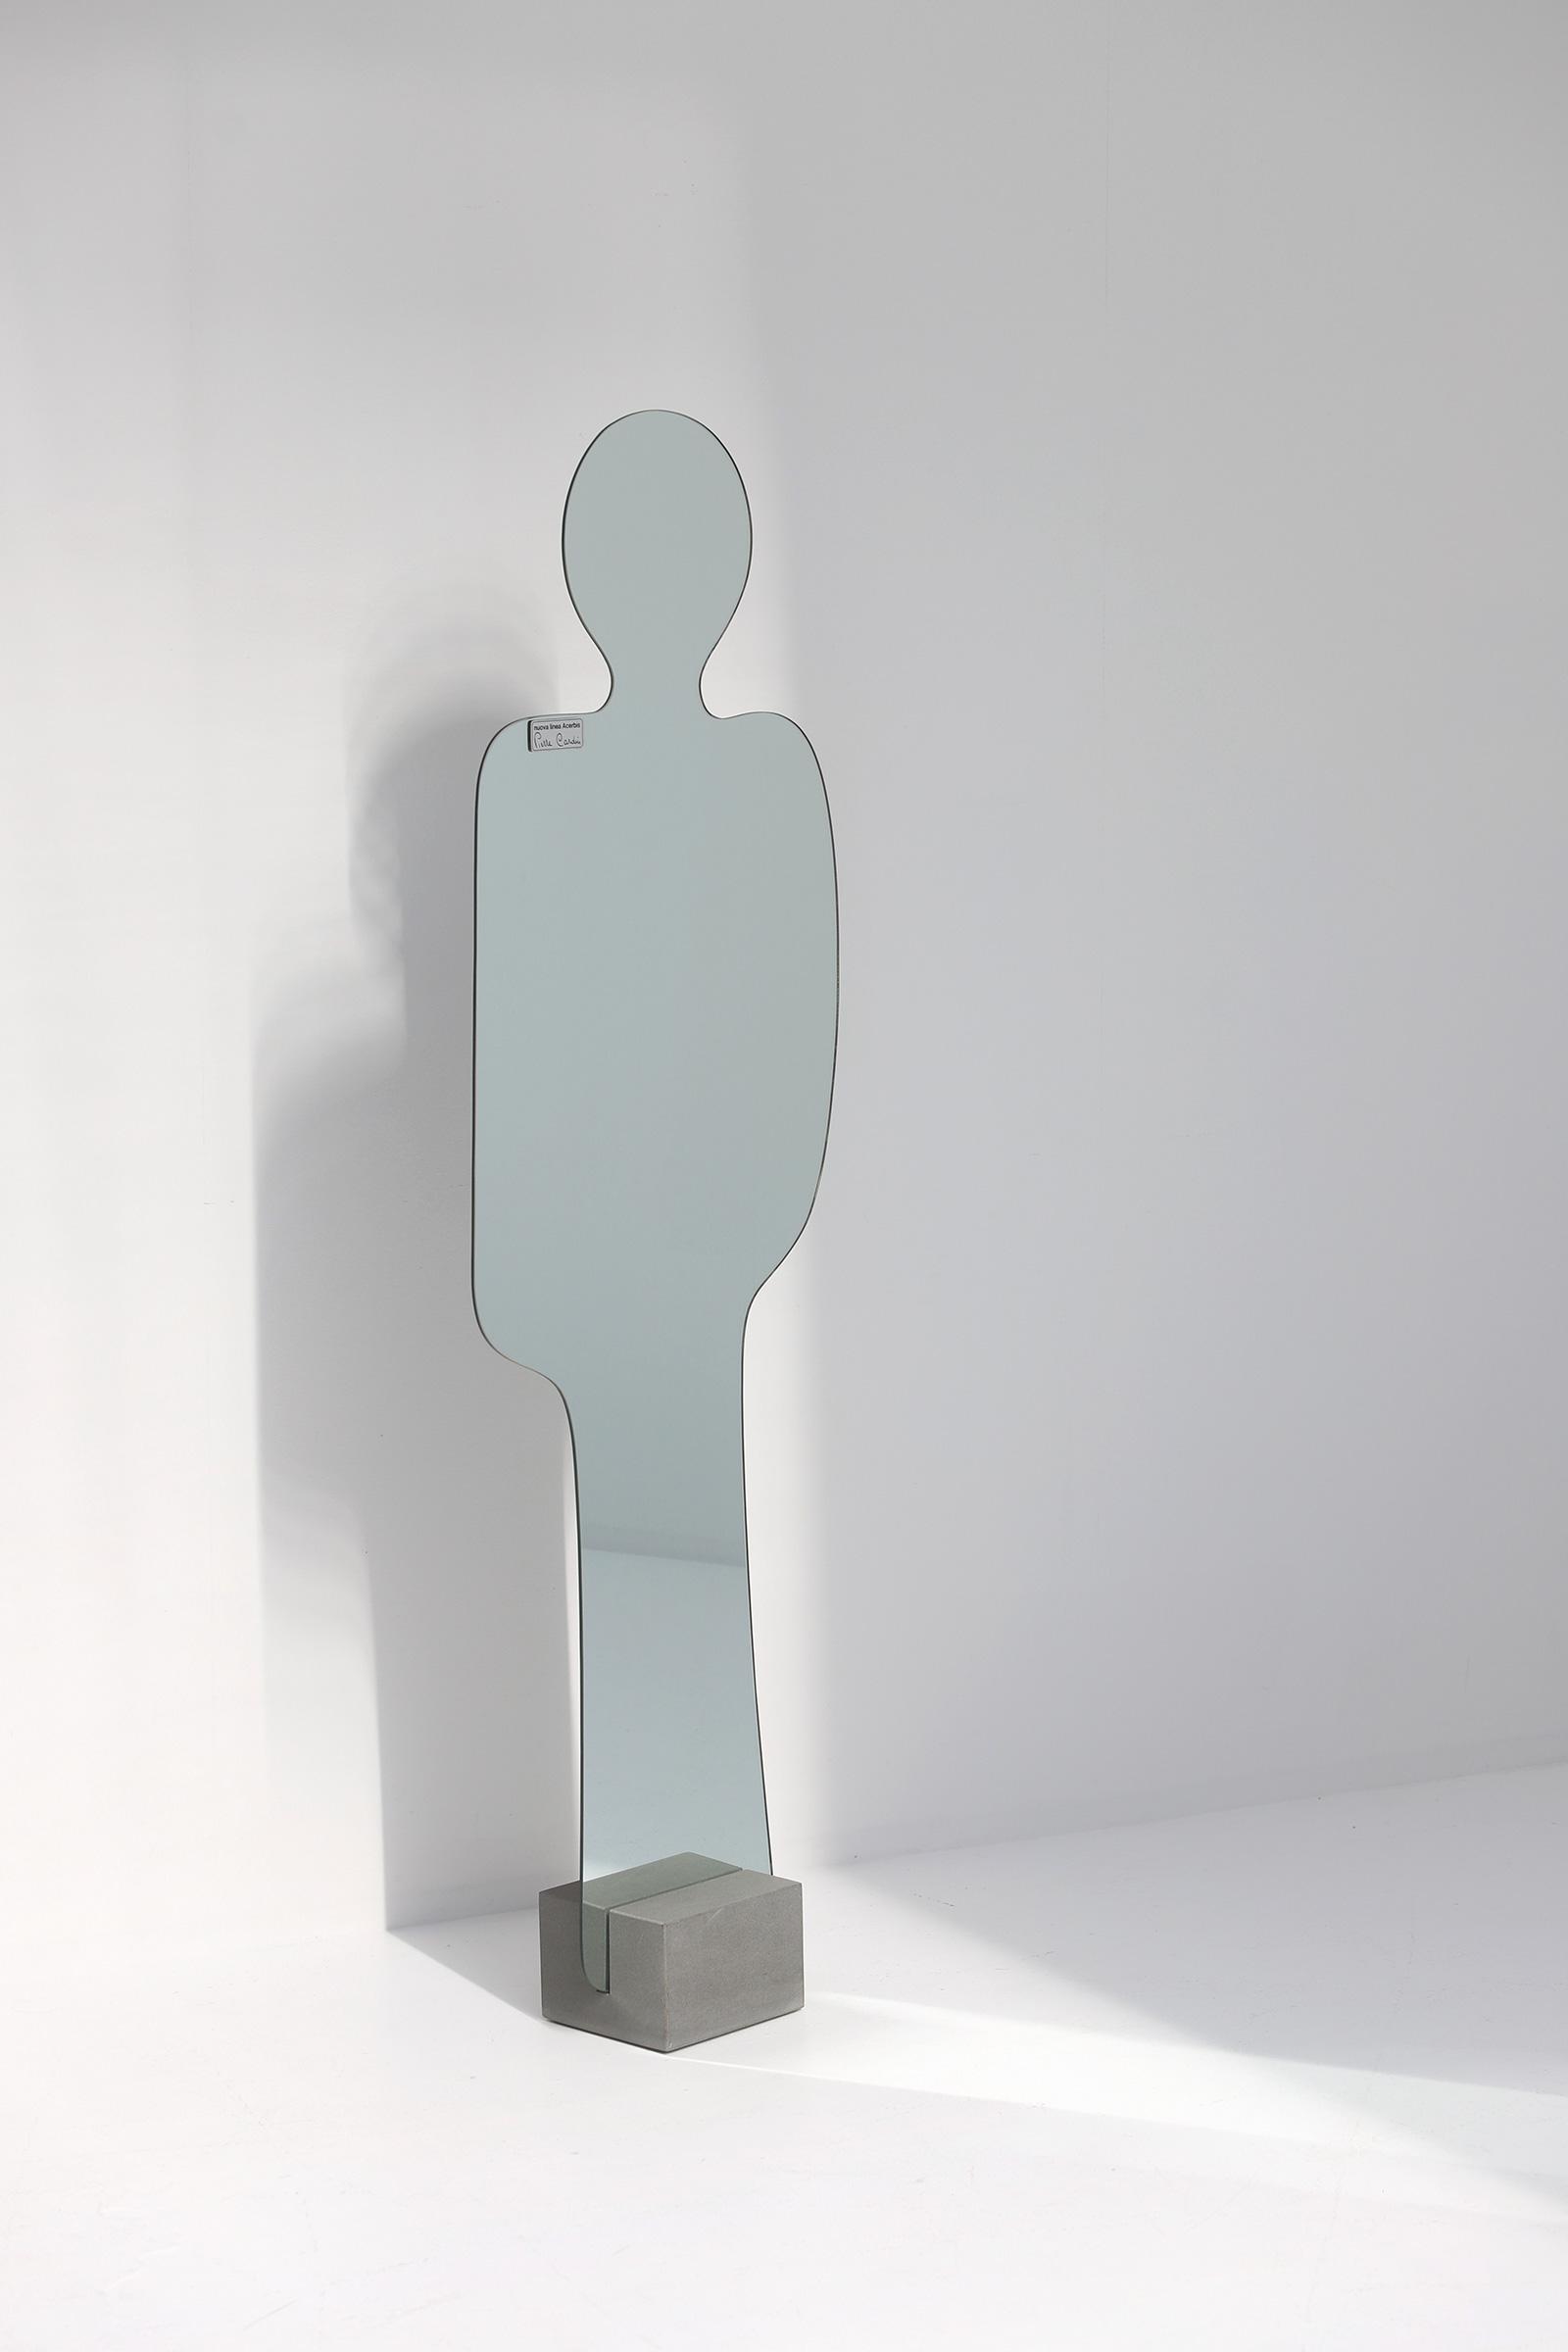 Pierre Cardin Silhouette shaped mirrorimage 2